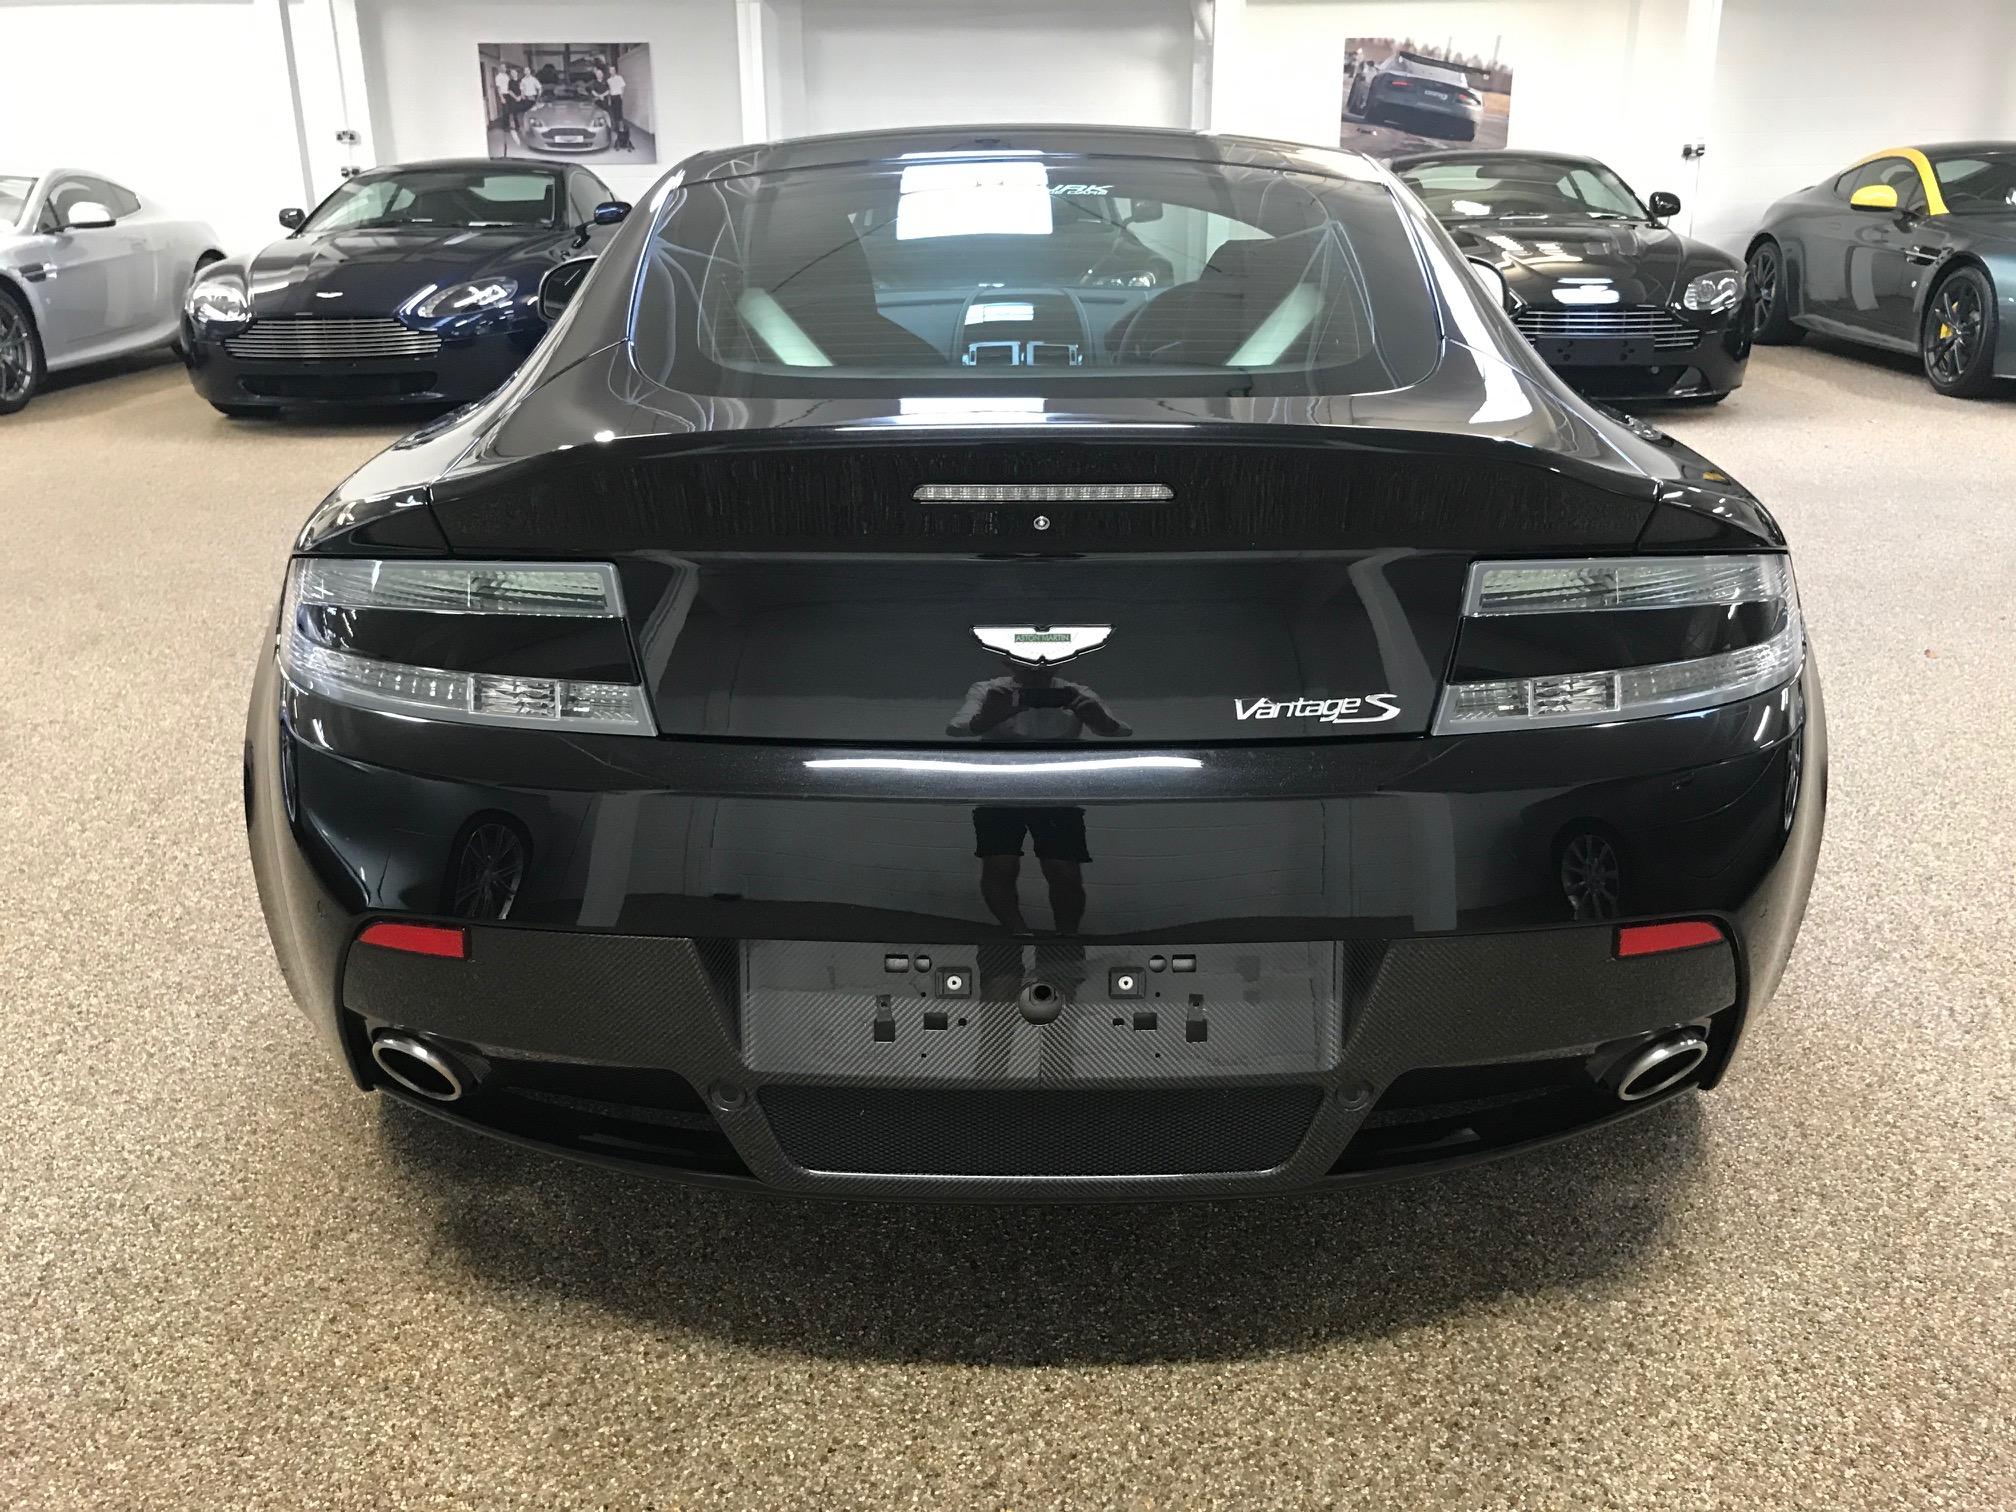 Used Aston Martin Vantage S for sale